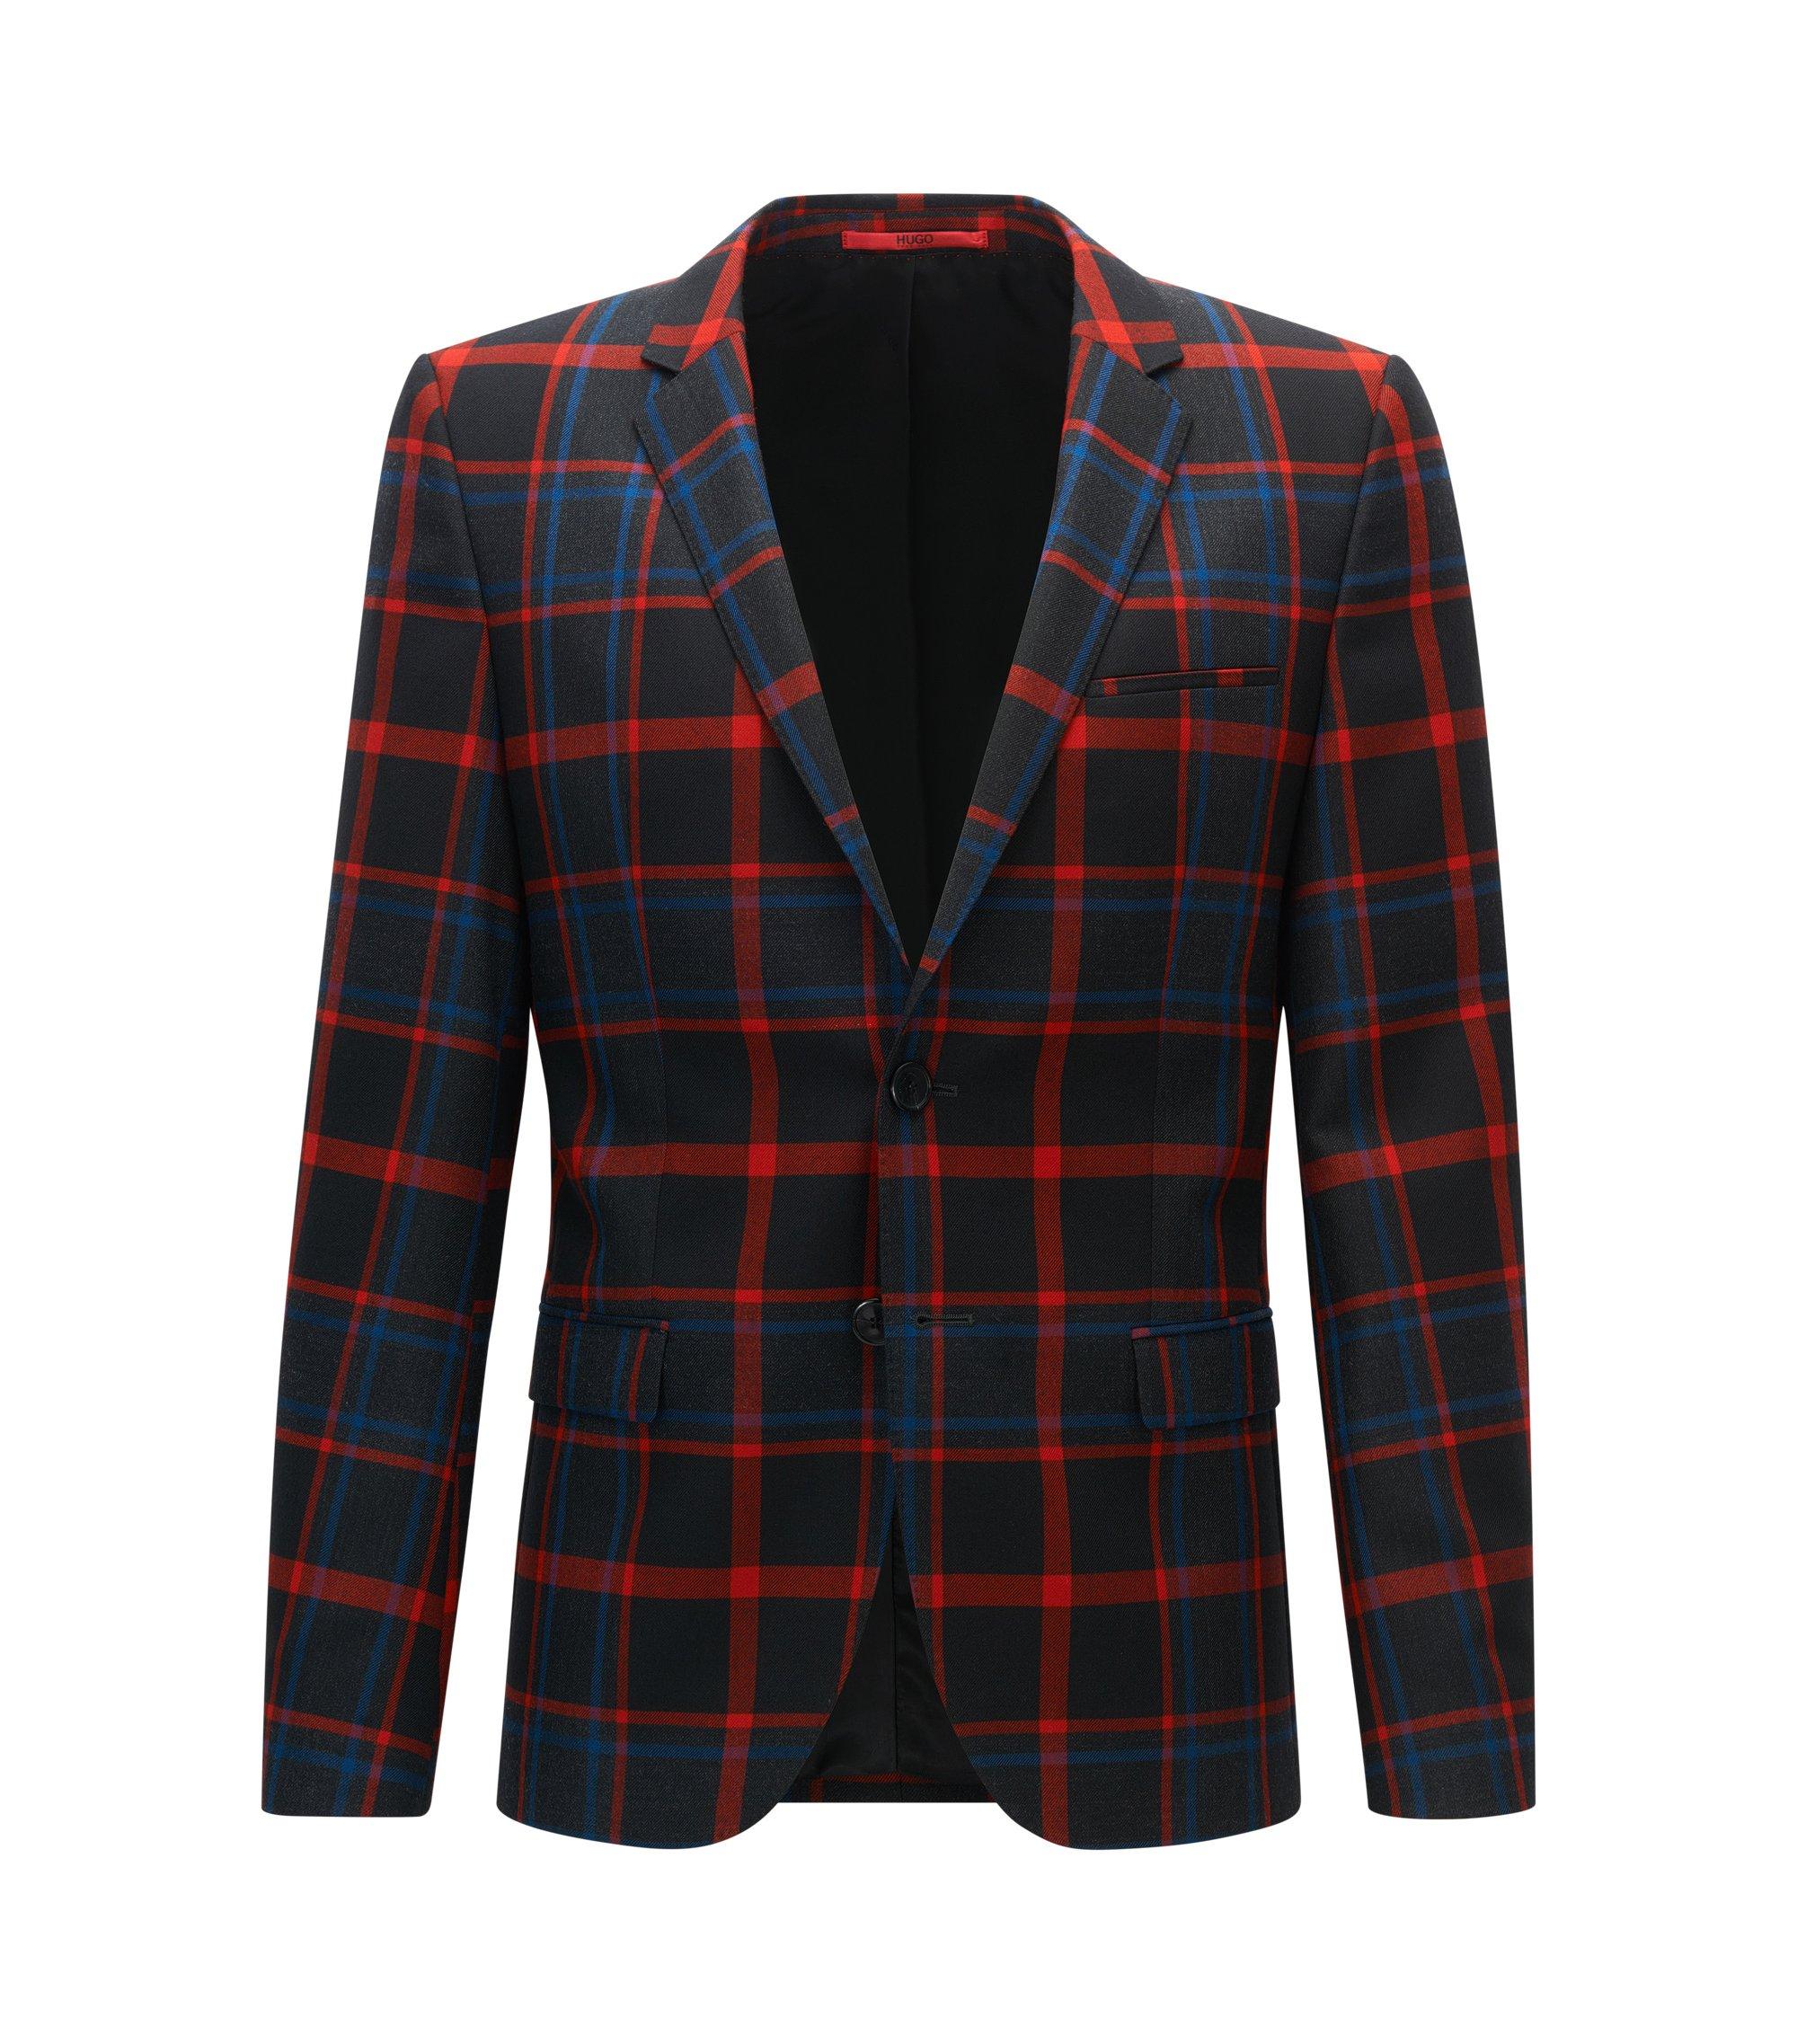 Plaid Virgin Wool Sport Coat, Extra Slim Fit | Arti, Patterned